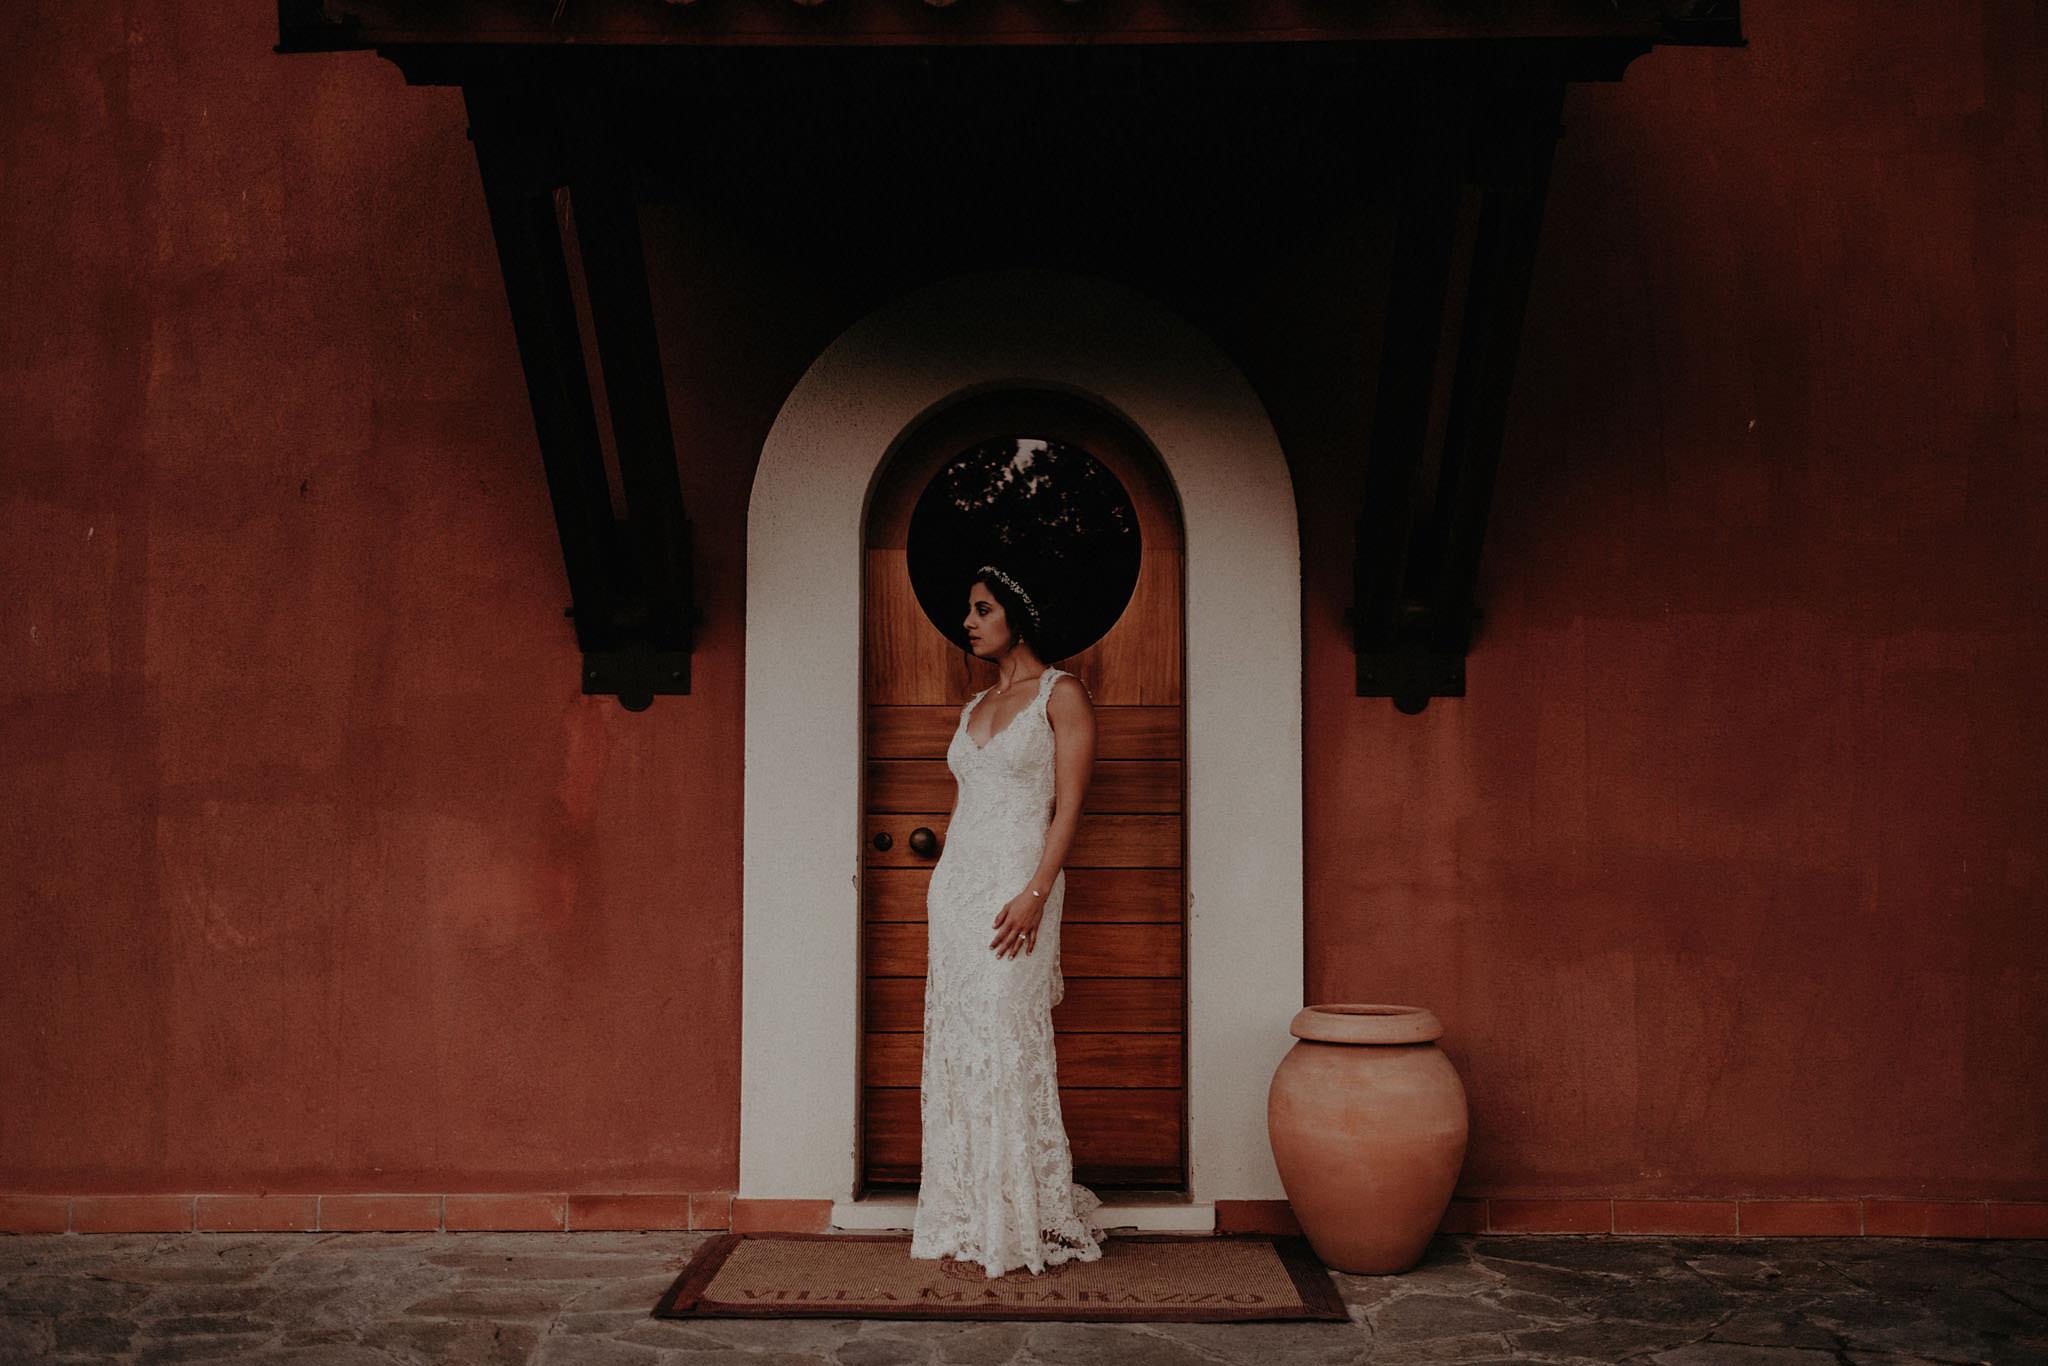 Max-Steph-Italy-Wedding-613.jpg